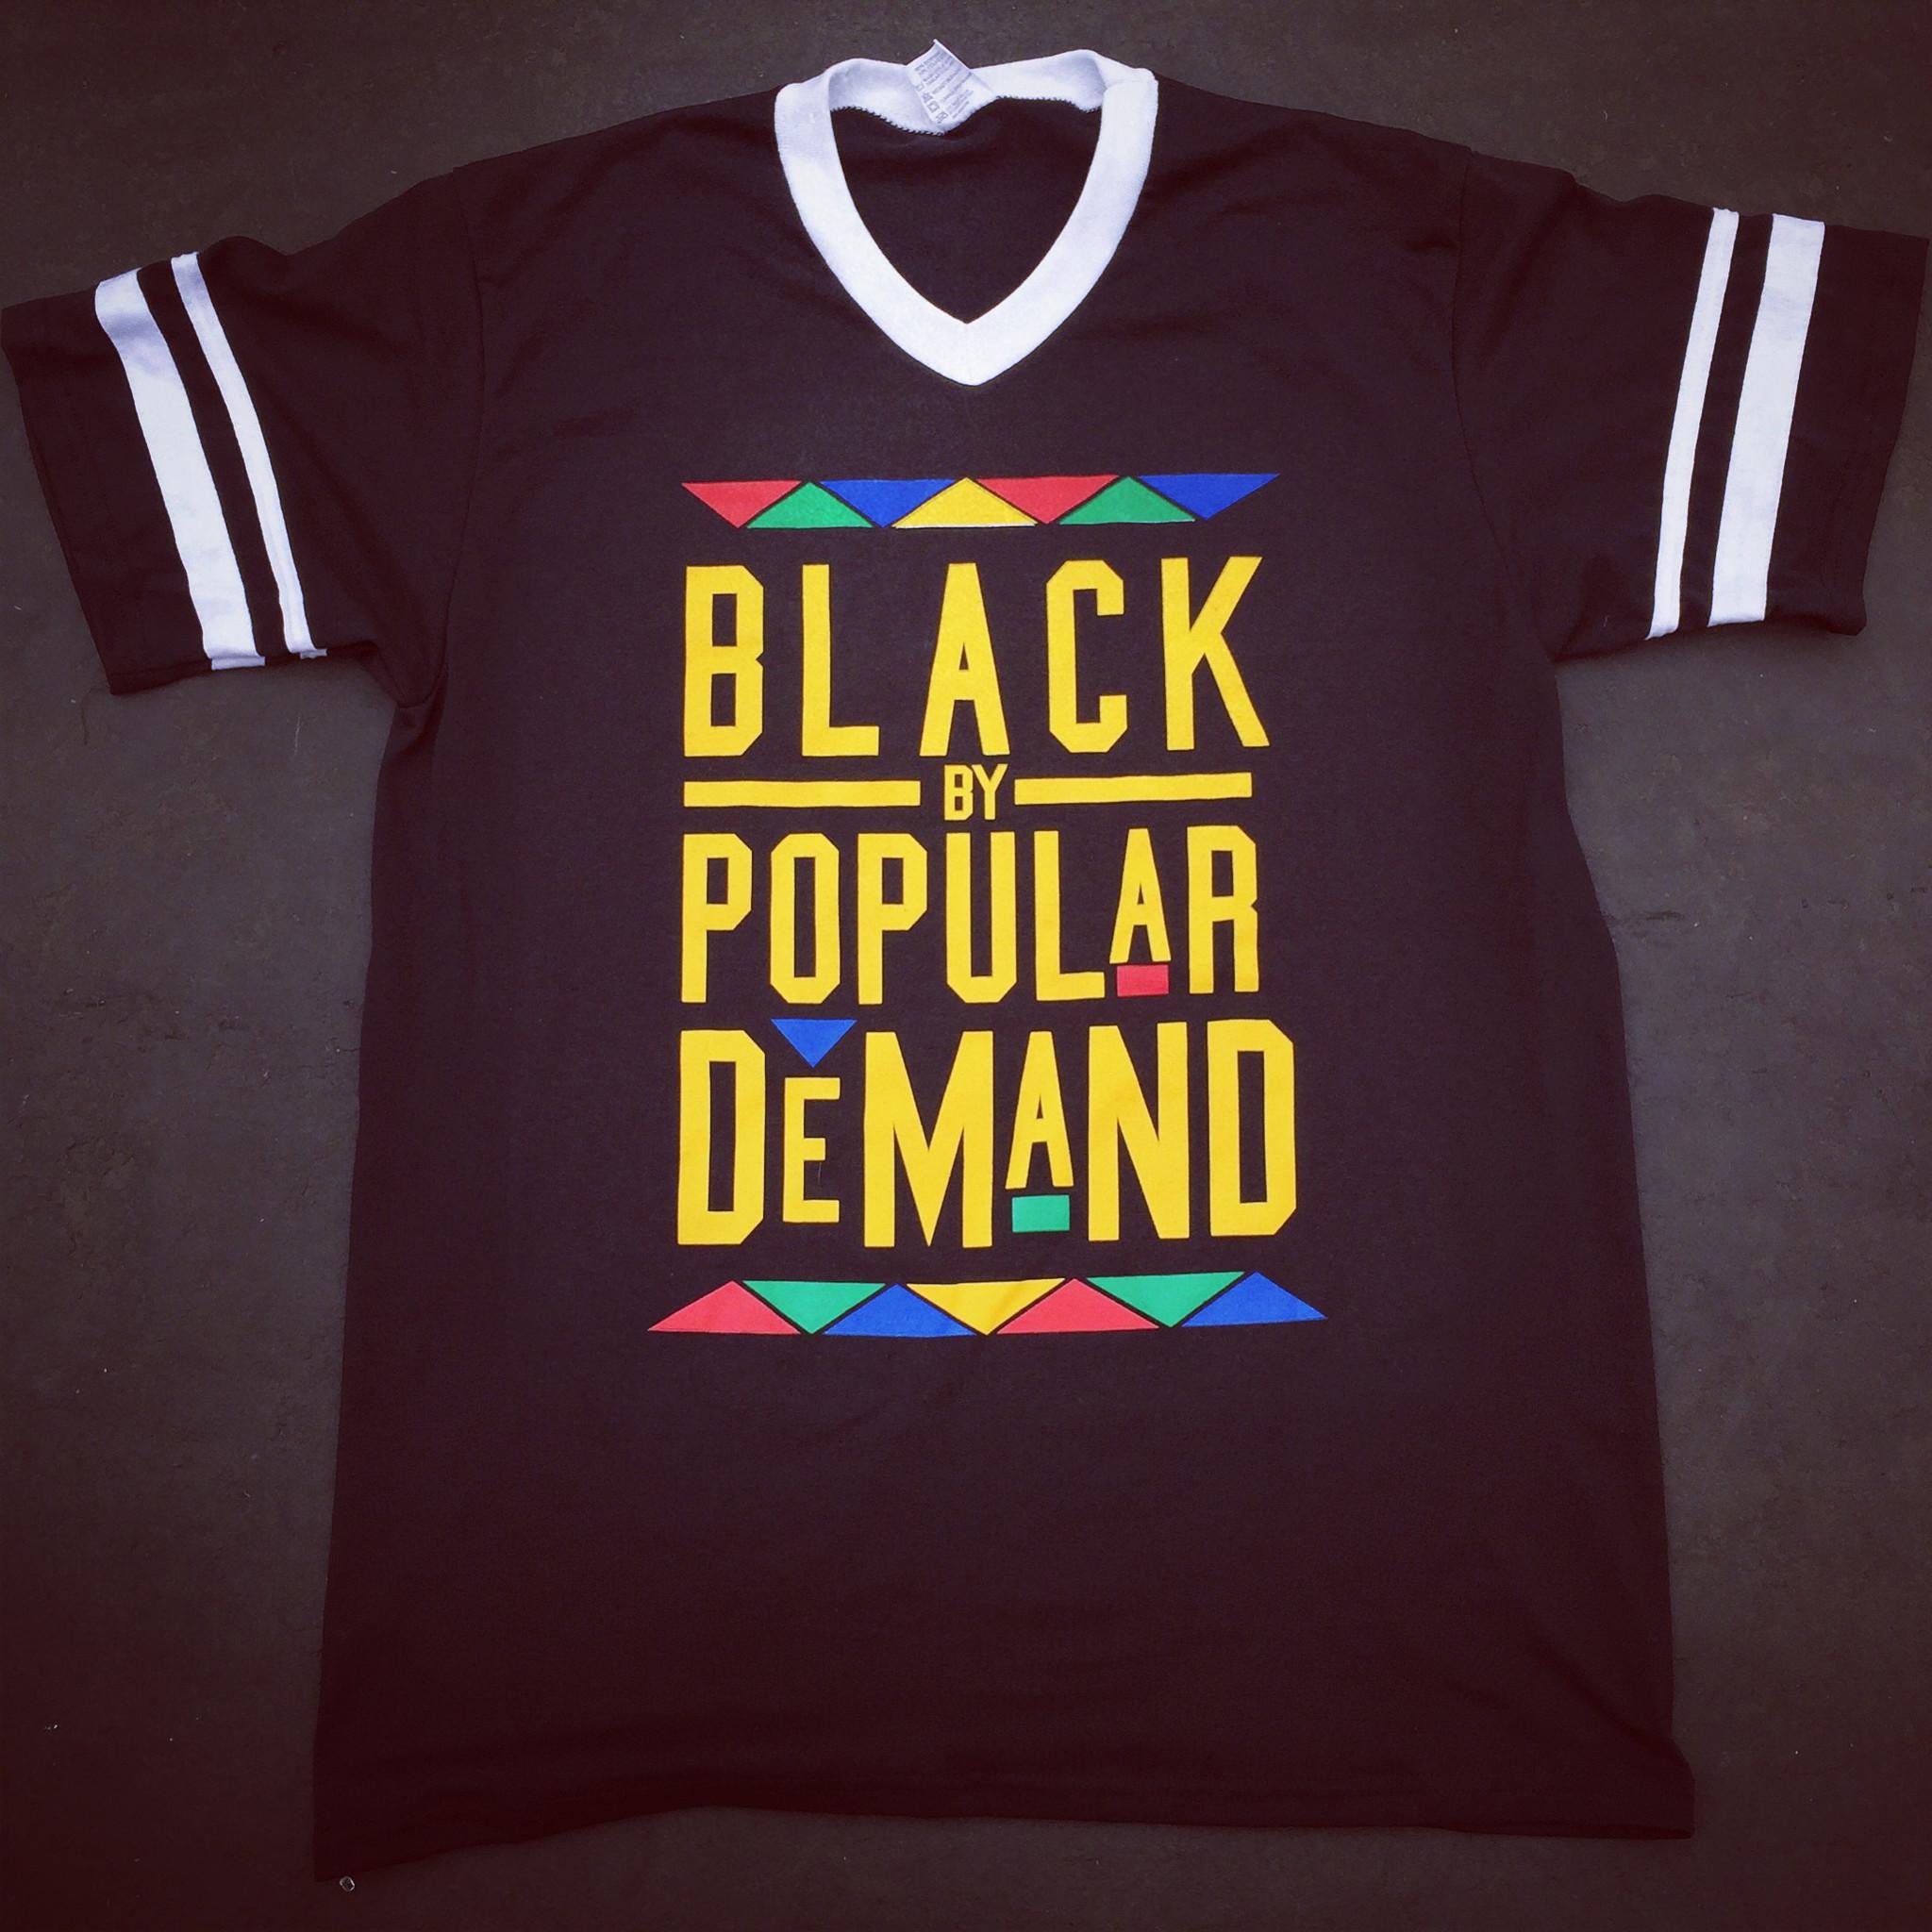 BLACK BY POPULAR DEMAND UNI JERSEY SHIRT